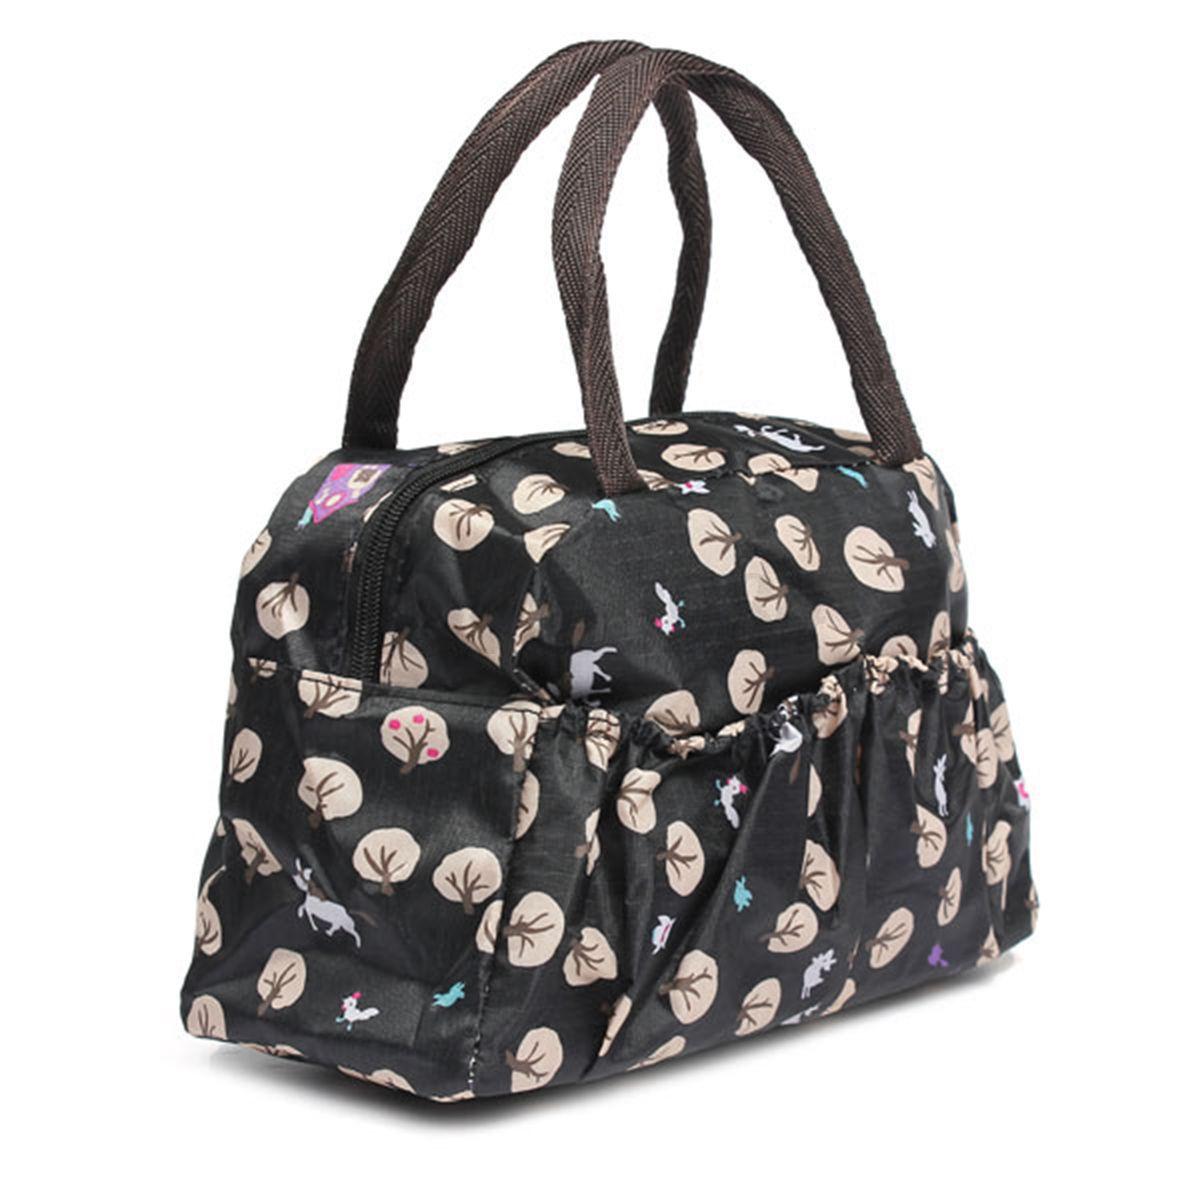 Women Outdoor Travel Lunch Bag Casual Handbag Picnic